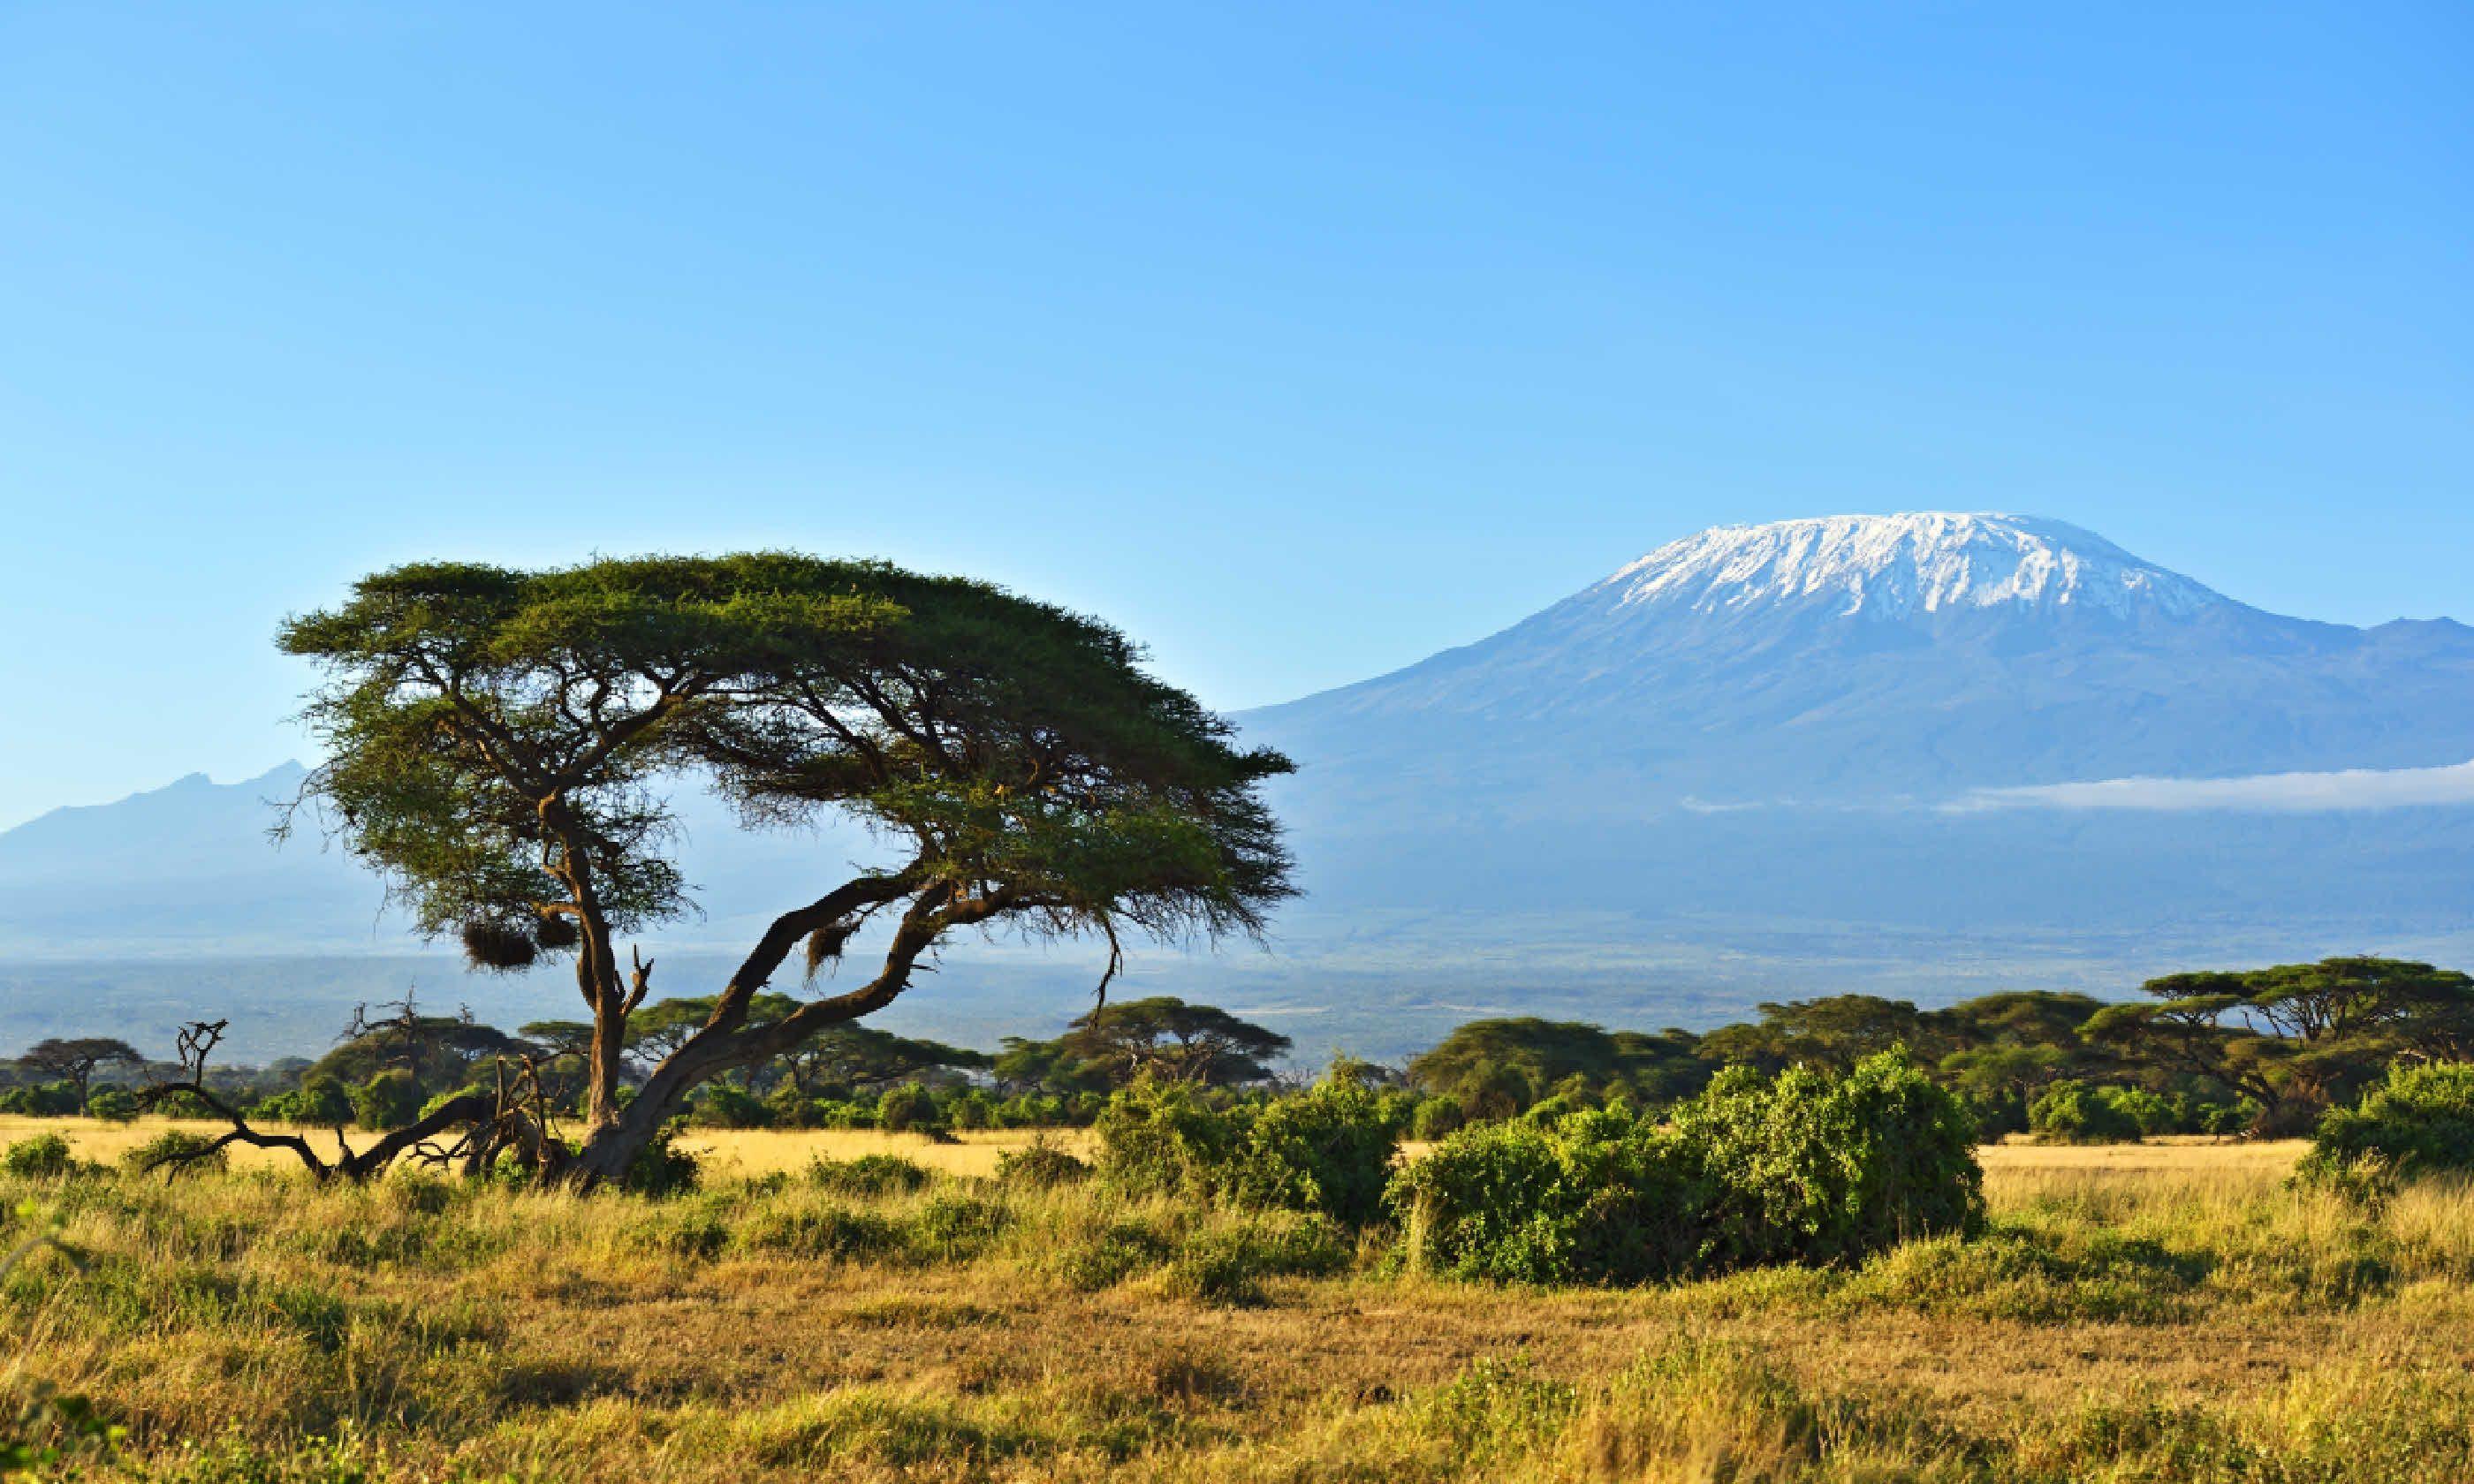 Mount Kilimanjaro (Shutterstock)